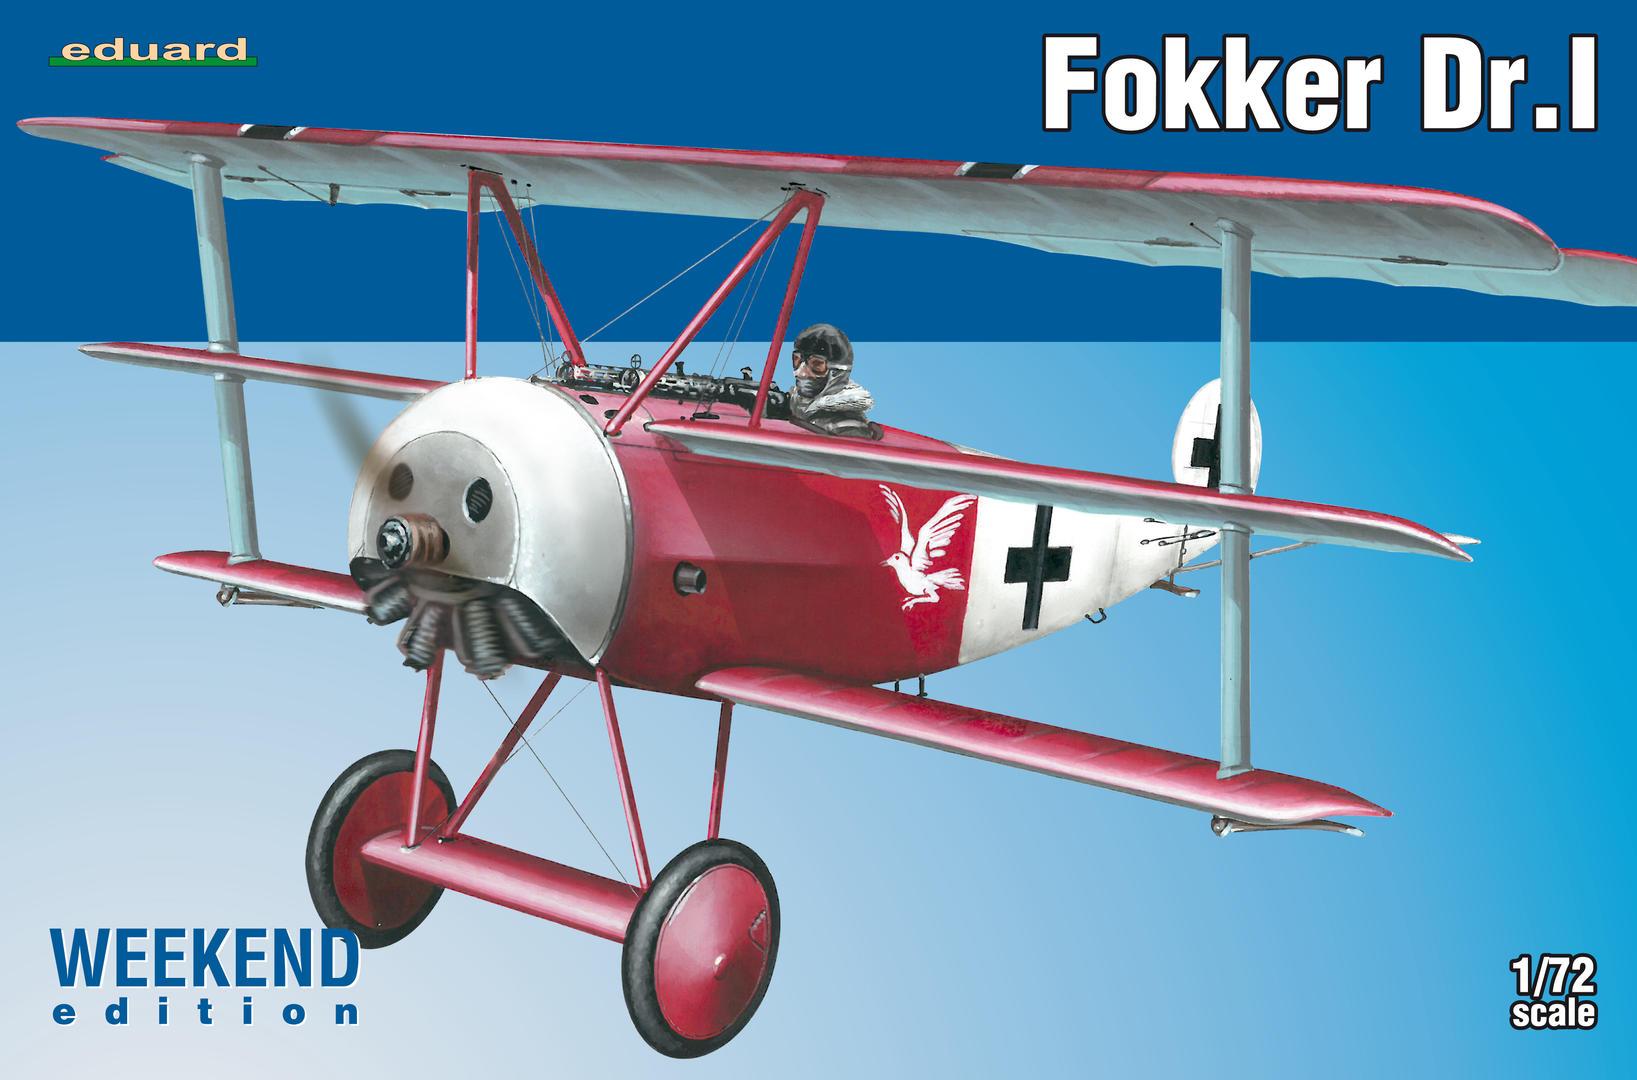 Eduard-7438-Fokker-Dr.-I-WEEKEND-9 Fokker Dr. I WEEKEND 1:72 (Eduard # 7438)